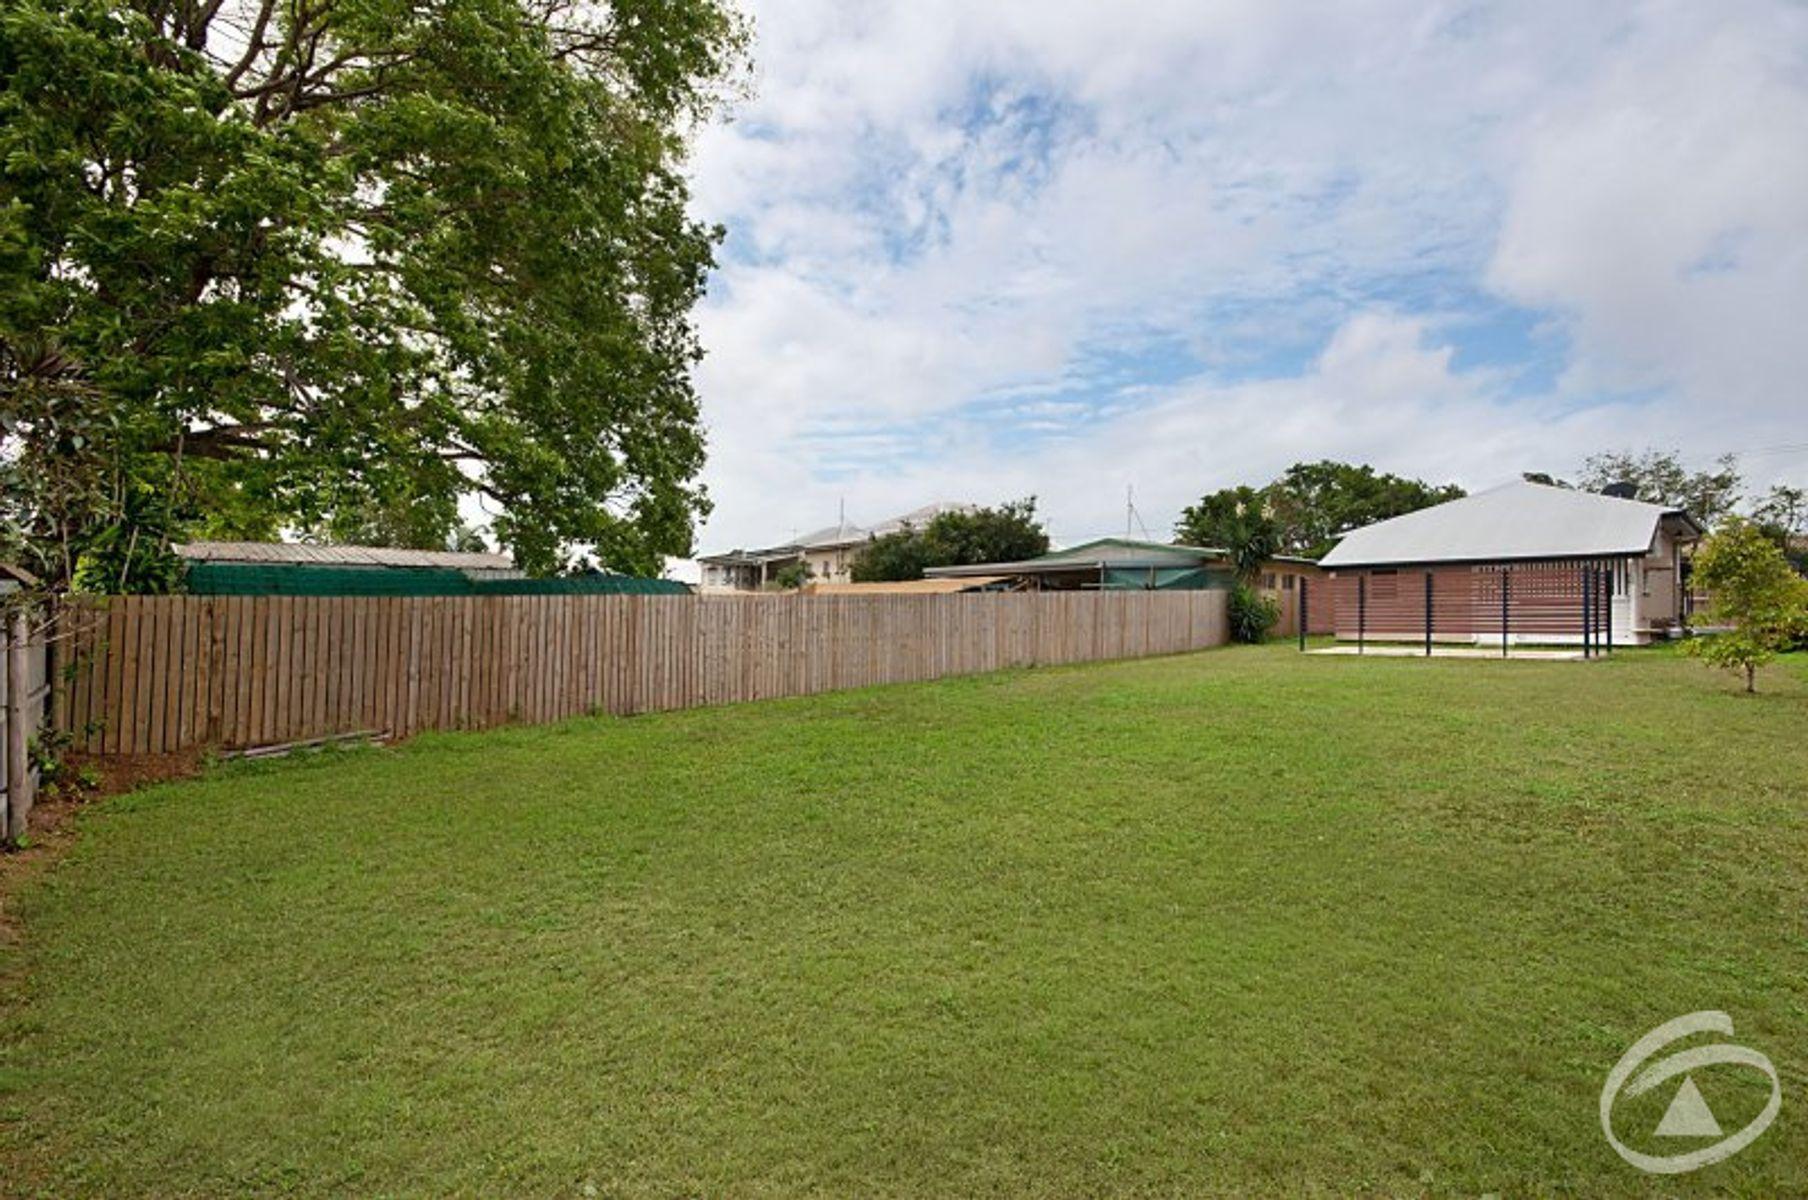 227 Lyons Street, Westcourt, QLD 4870